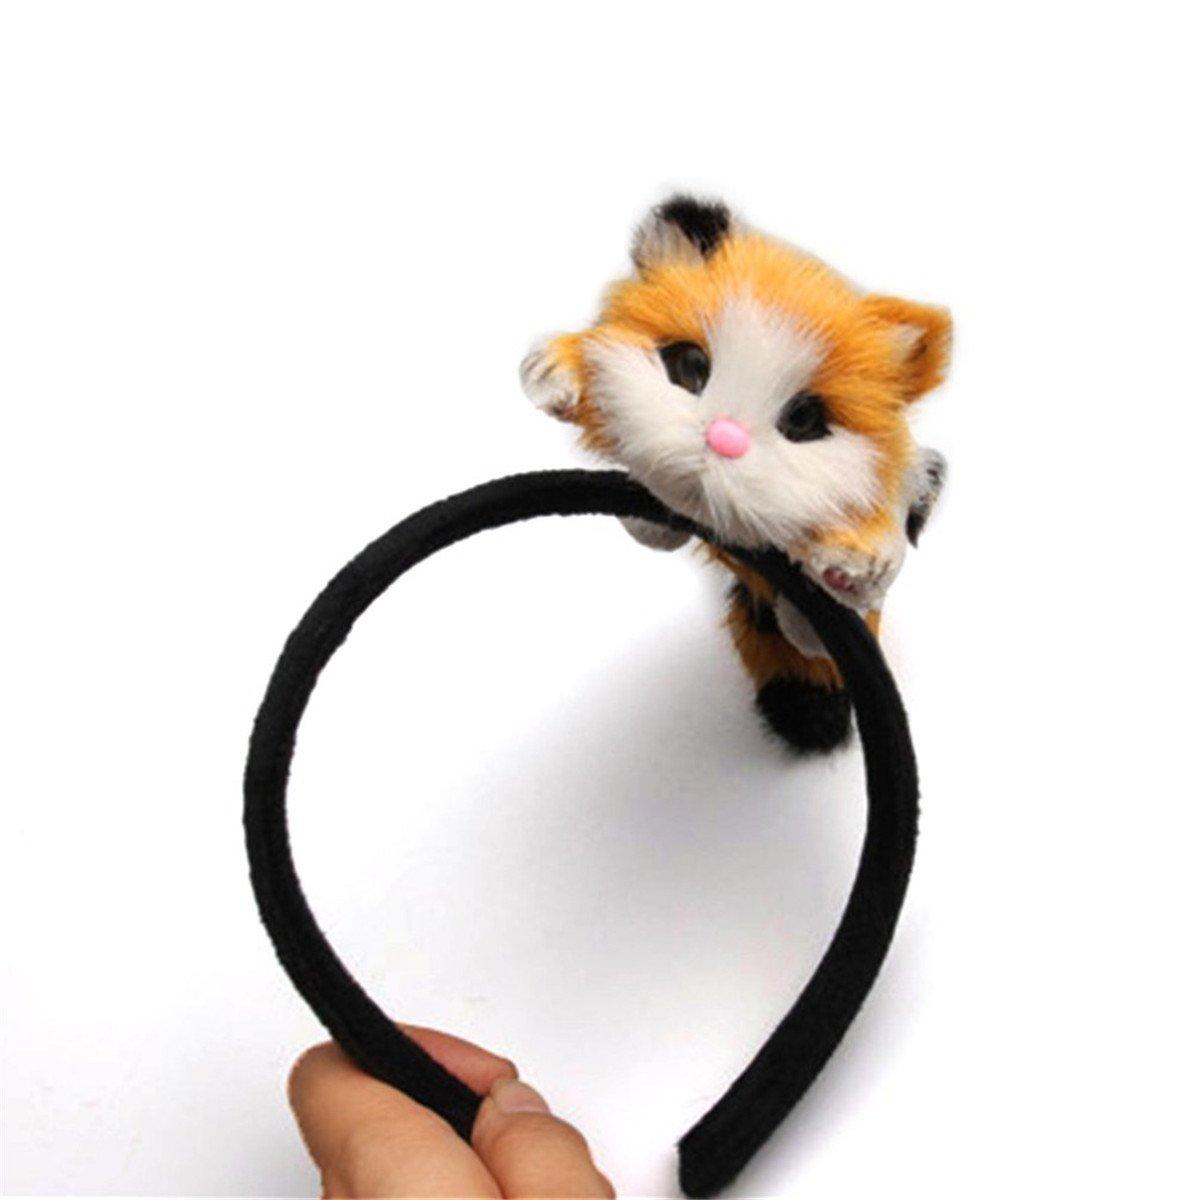 10pcs Women Cute Cat Kitty Kitten Ears Headband Hair Band Cosplay Party RDJ BHV